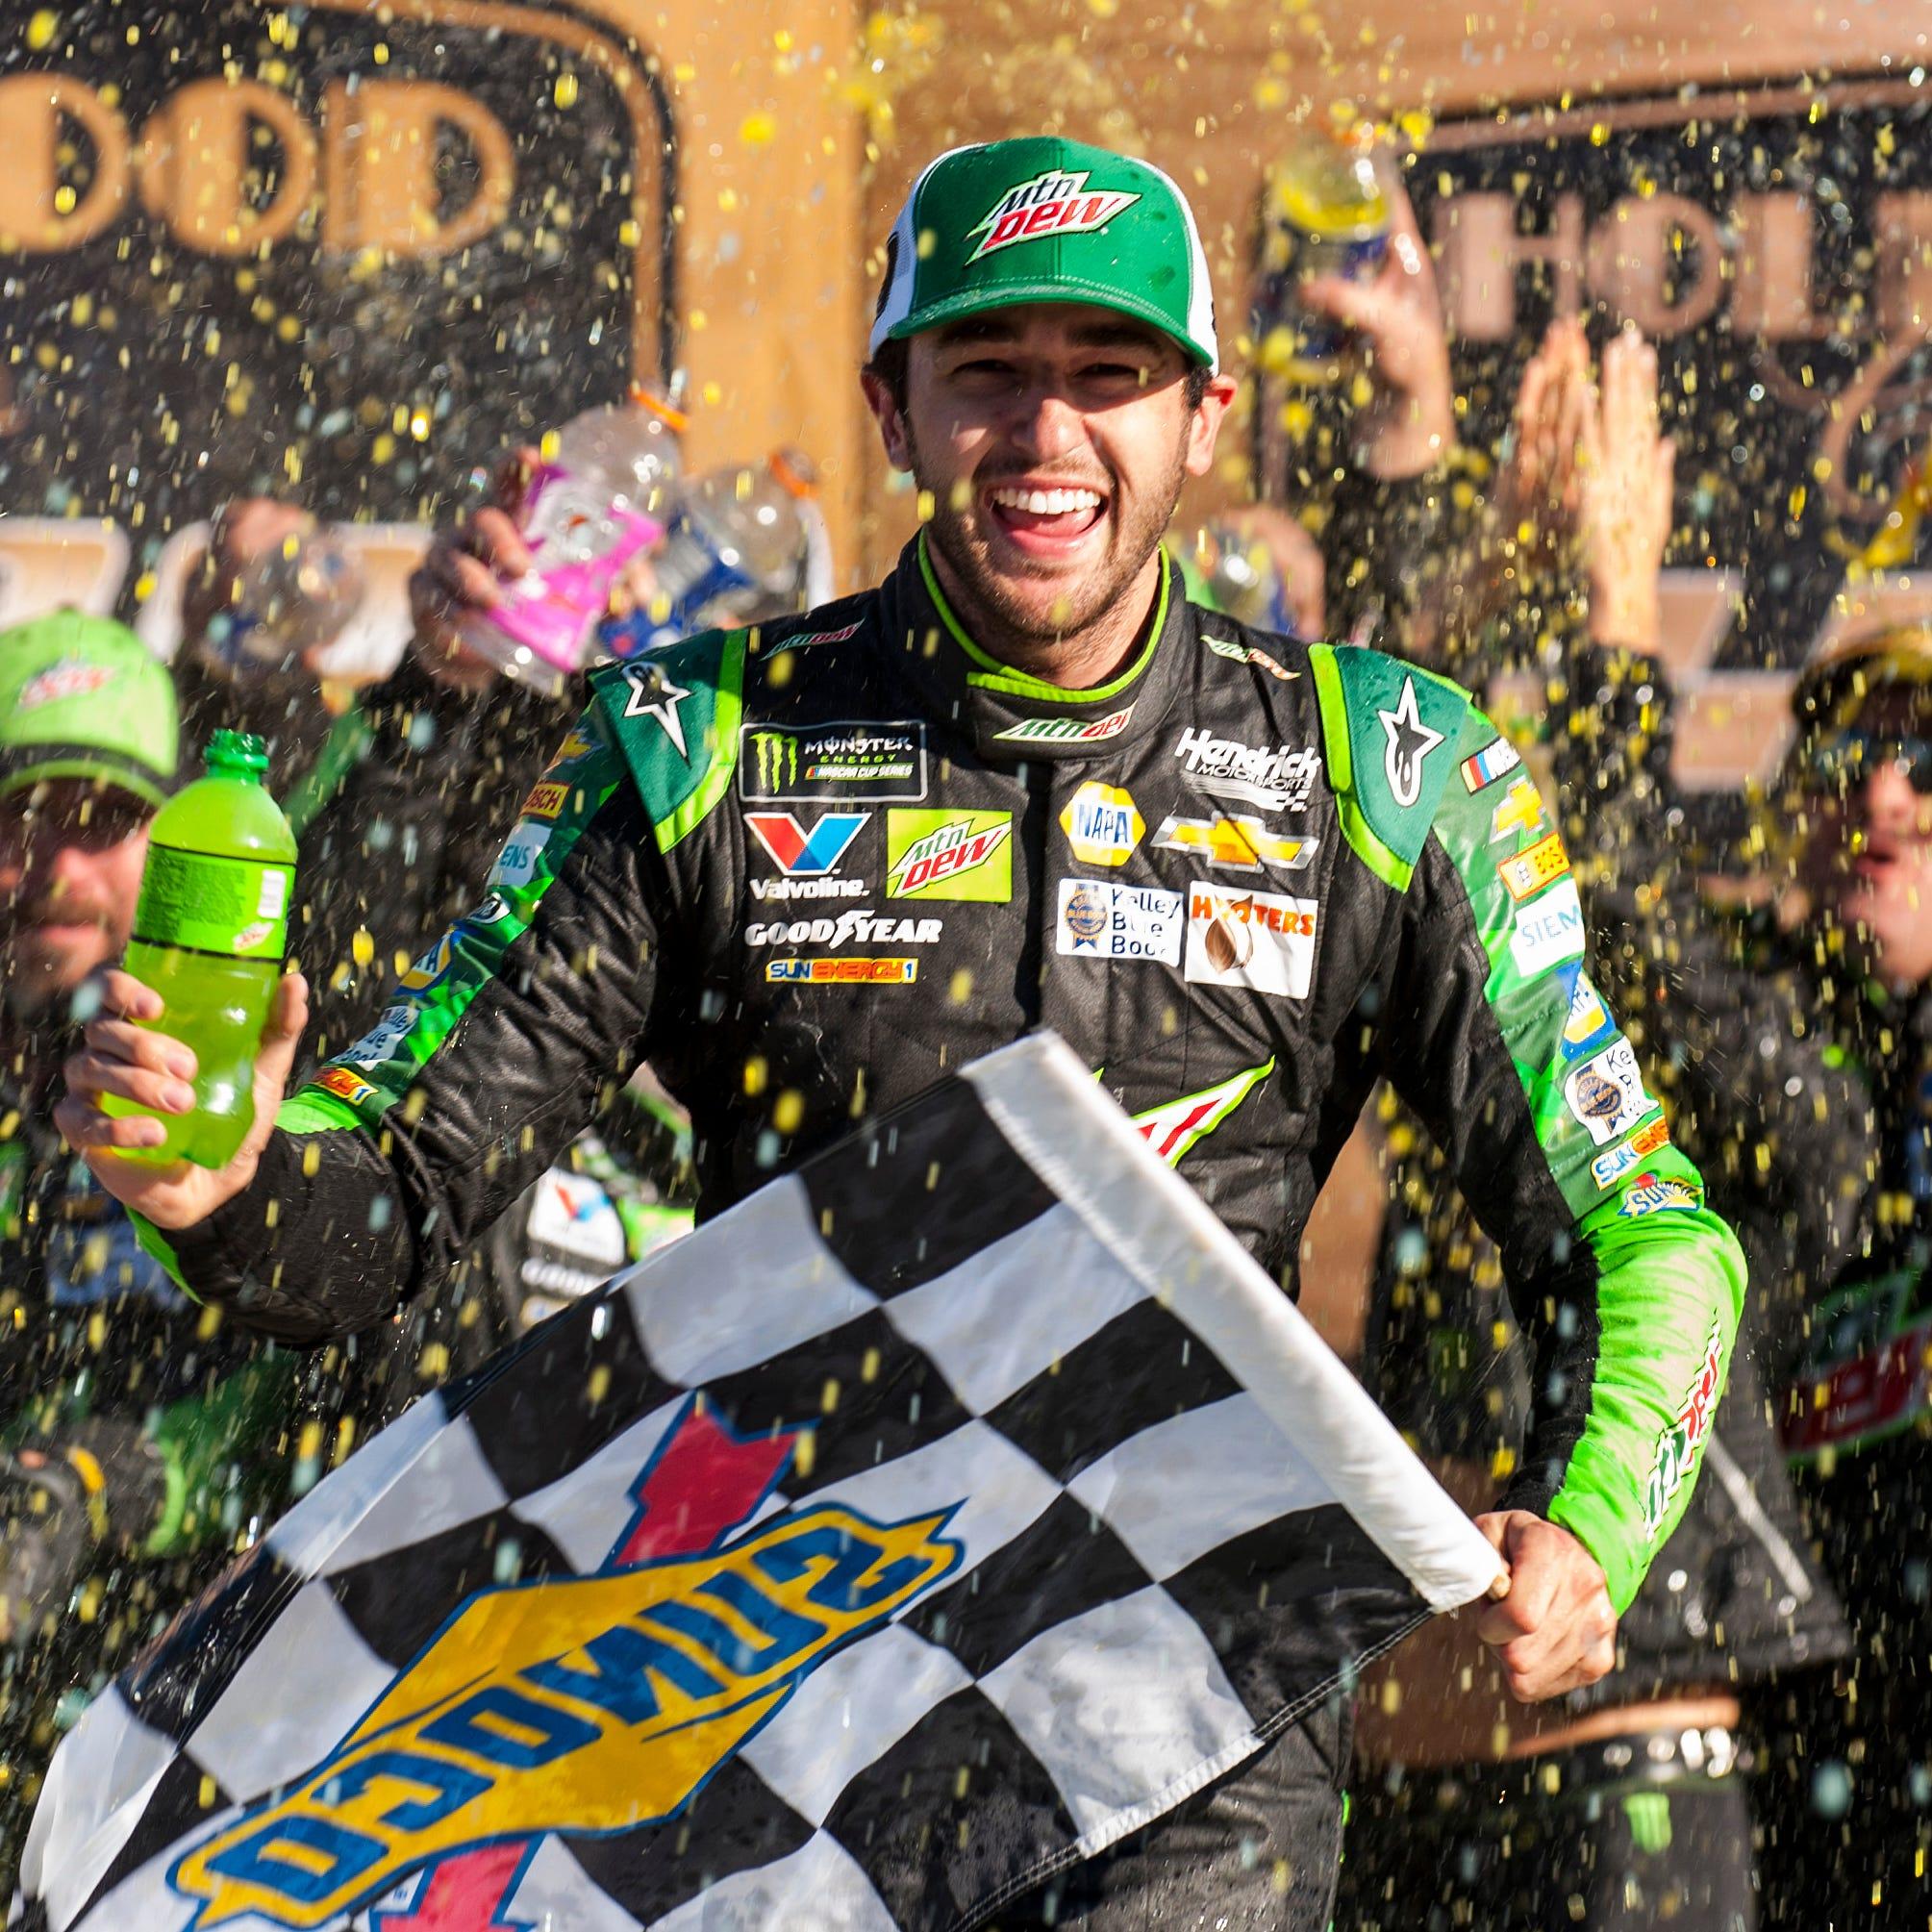 Chase Elliott wins Kansas playoff race; Keselowski, Blaney among drivers eliminated